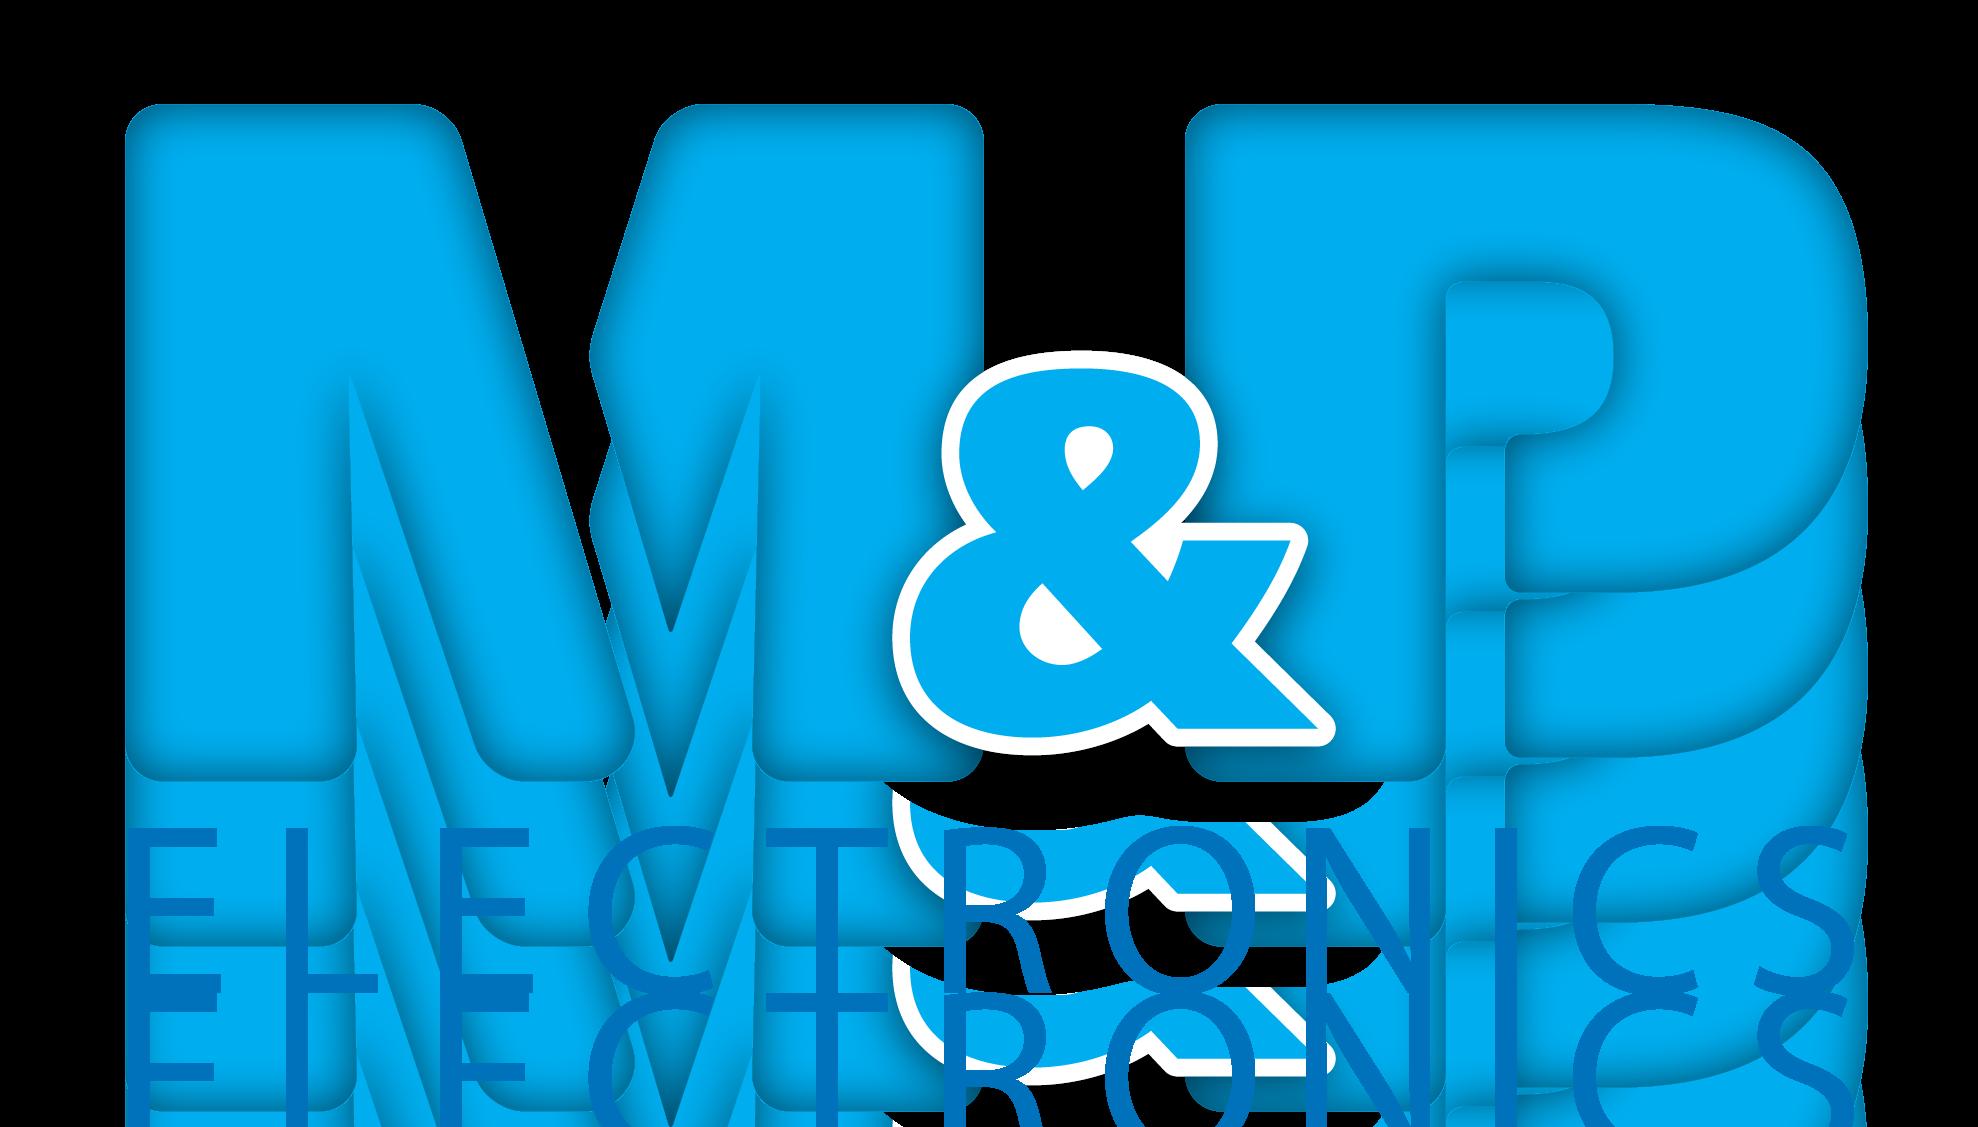 M&P Electronics srl